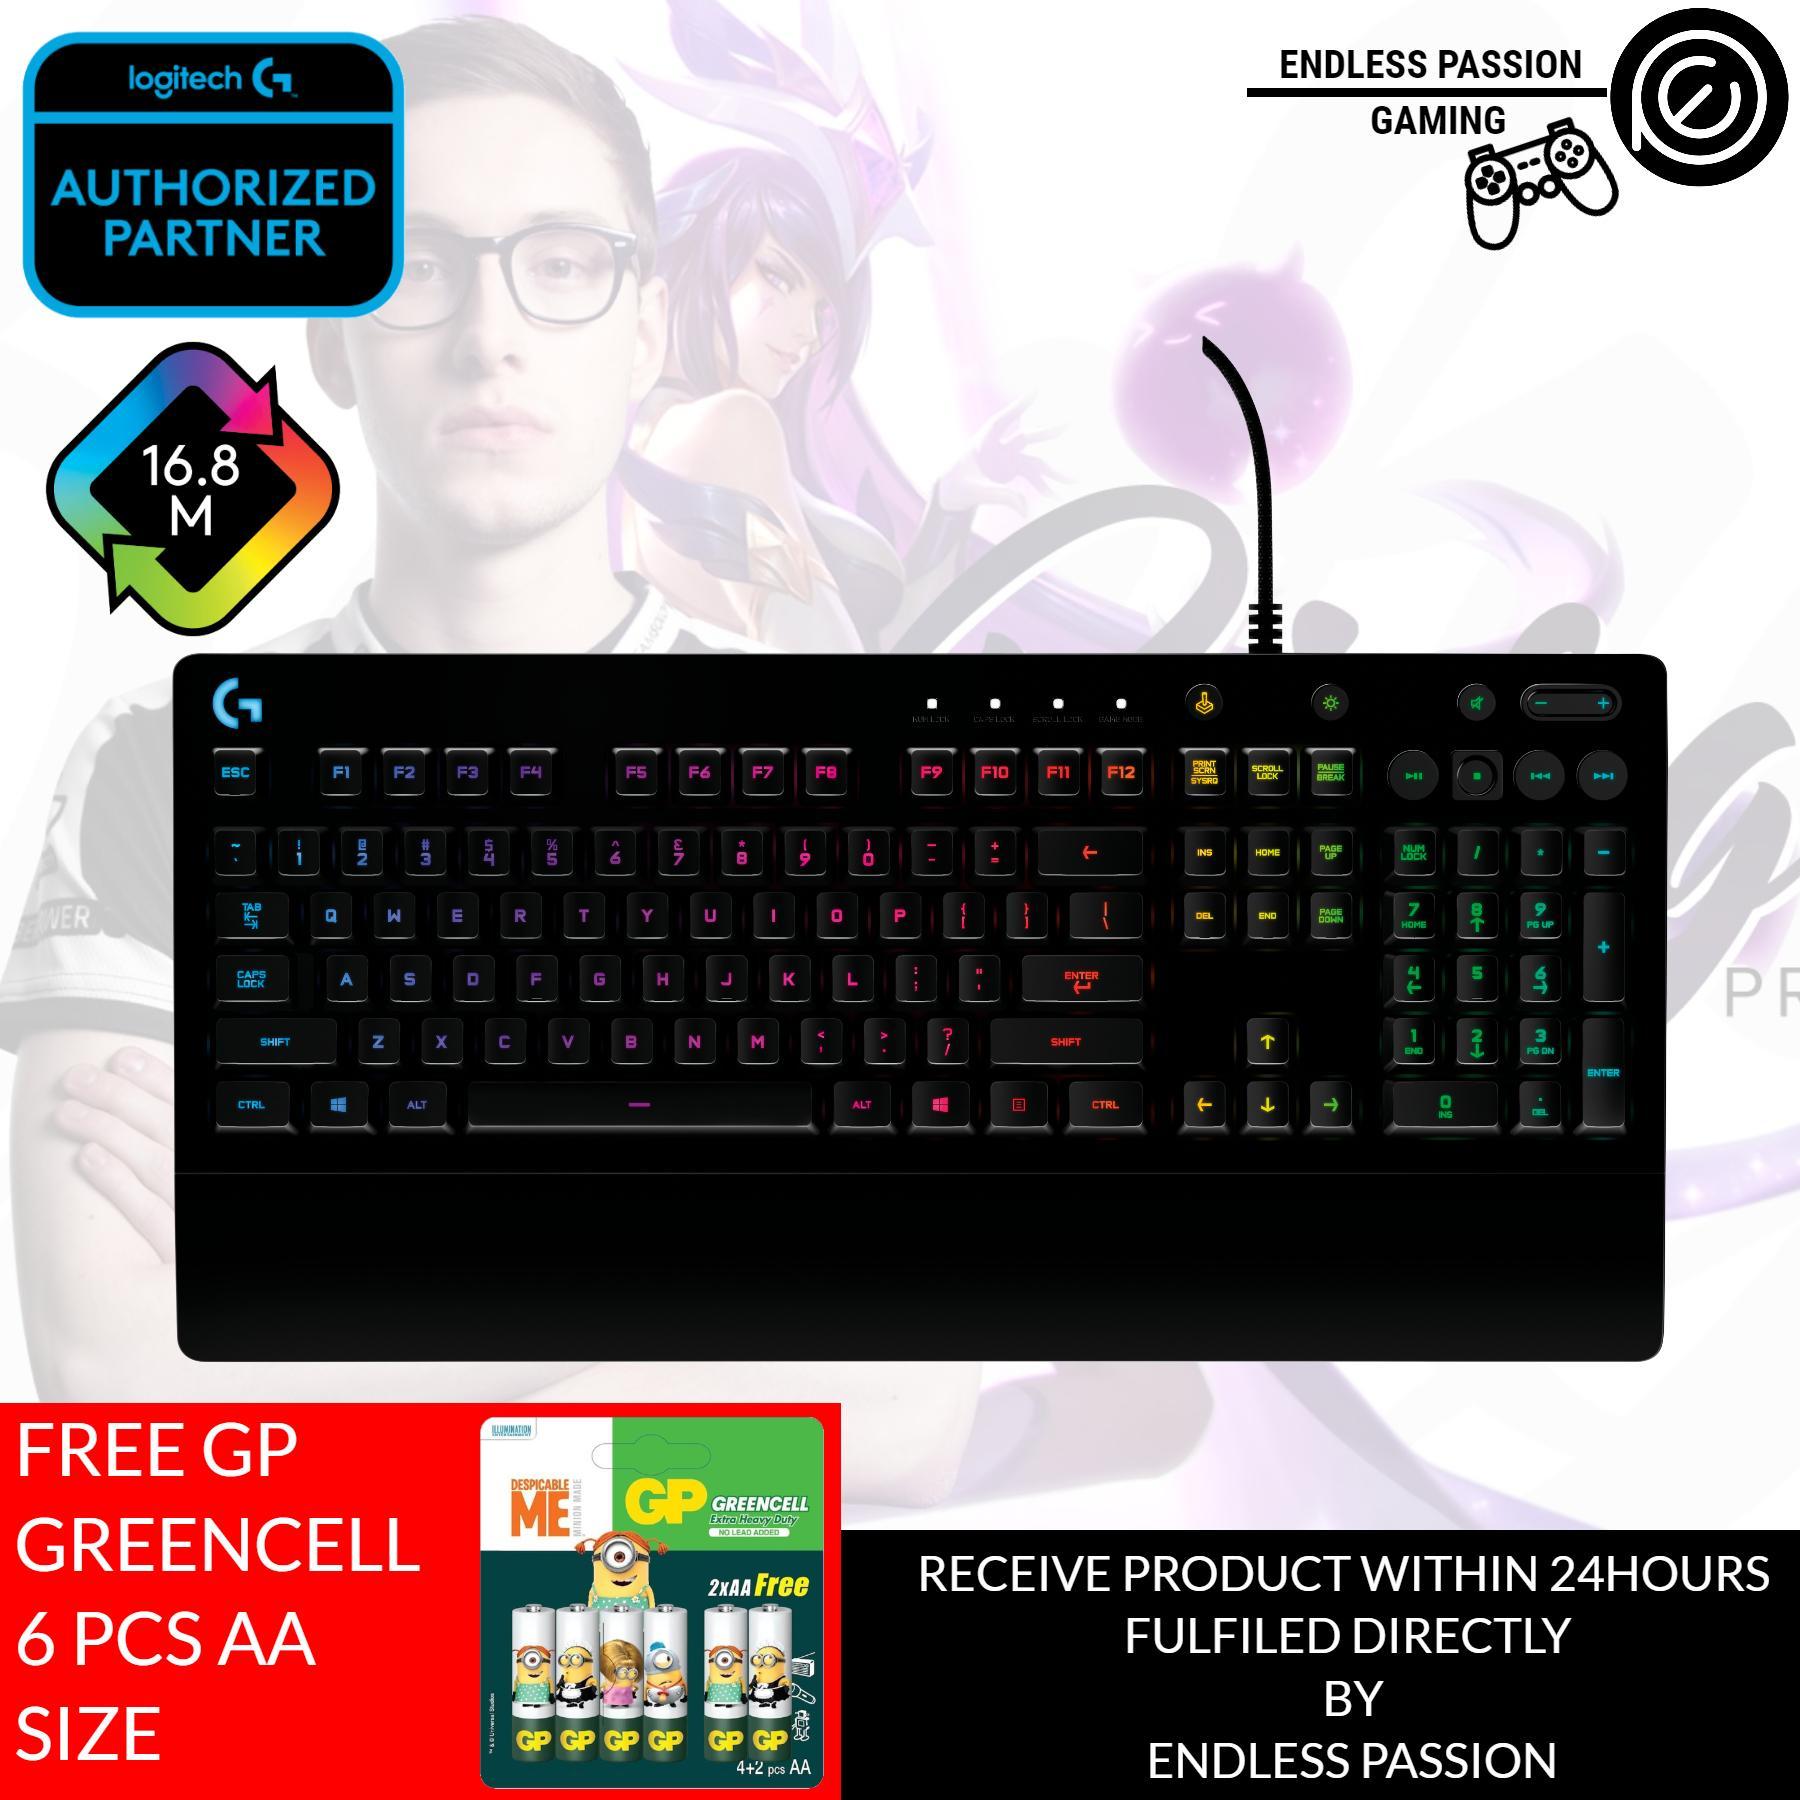 7392ed7fabb Logitech G213 Gaming Keyboard with Dedicated Media Controls, 16.8 Million  Lighting Colors Backlit Keys,